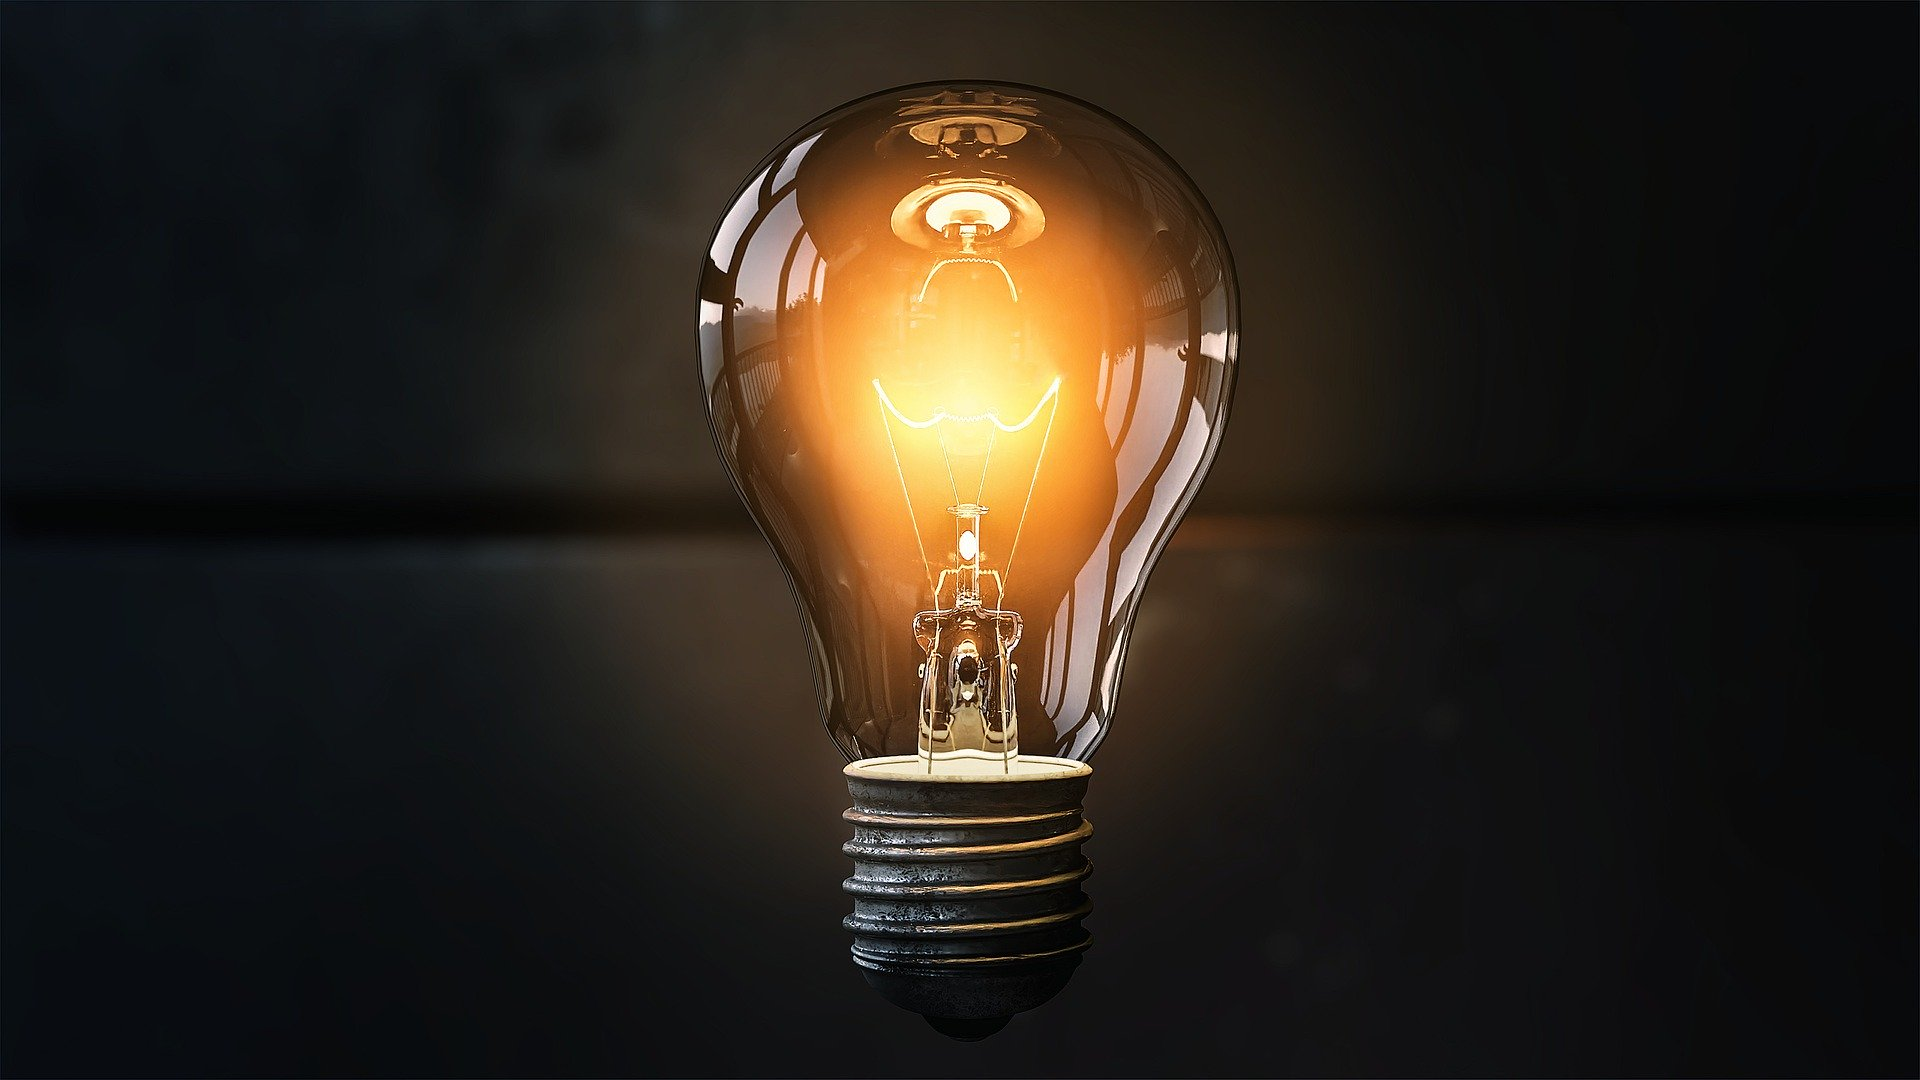 fourniture electricite edf confiant hiver 2020-2021 - L'Energeek